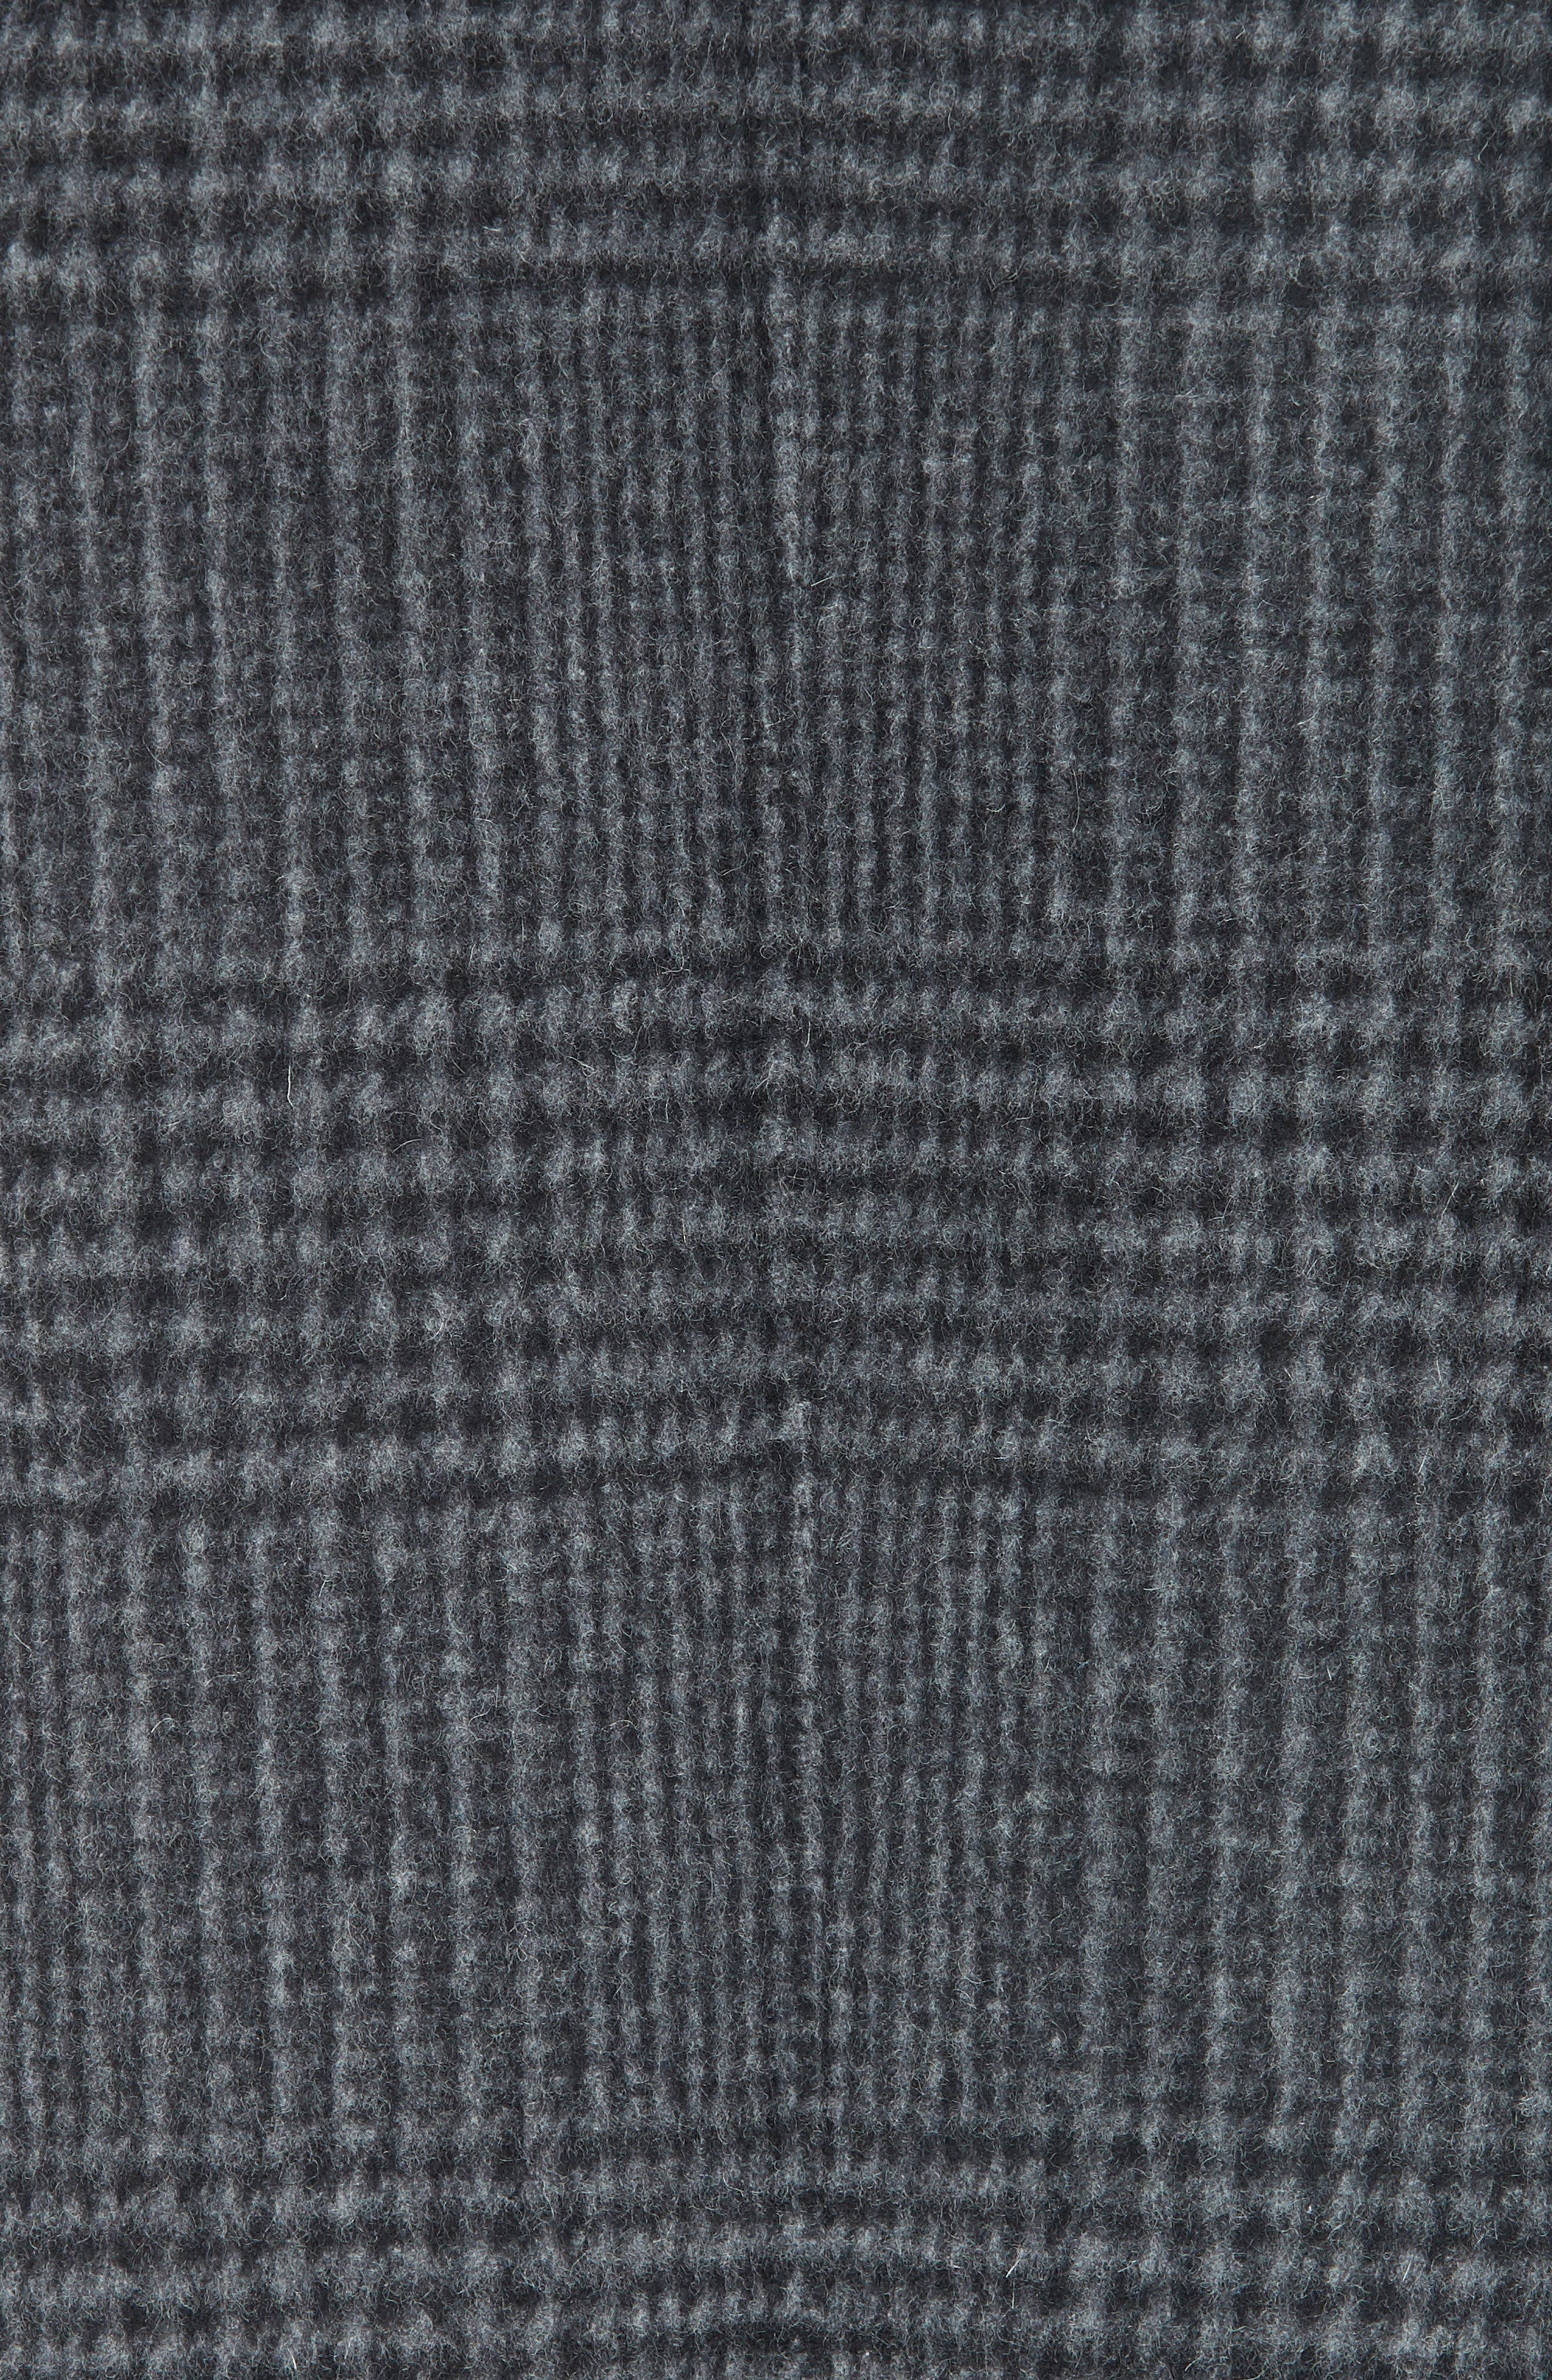 Plaid Wool Blend Coat,                             Alternate thumbnail 6, color,                             CHARCOAL GLEN PLAID